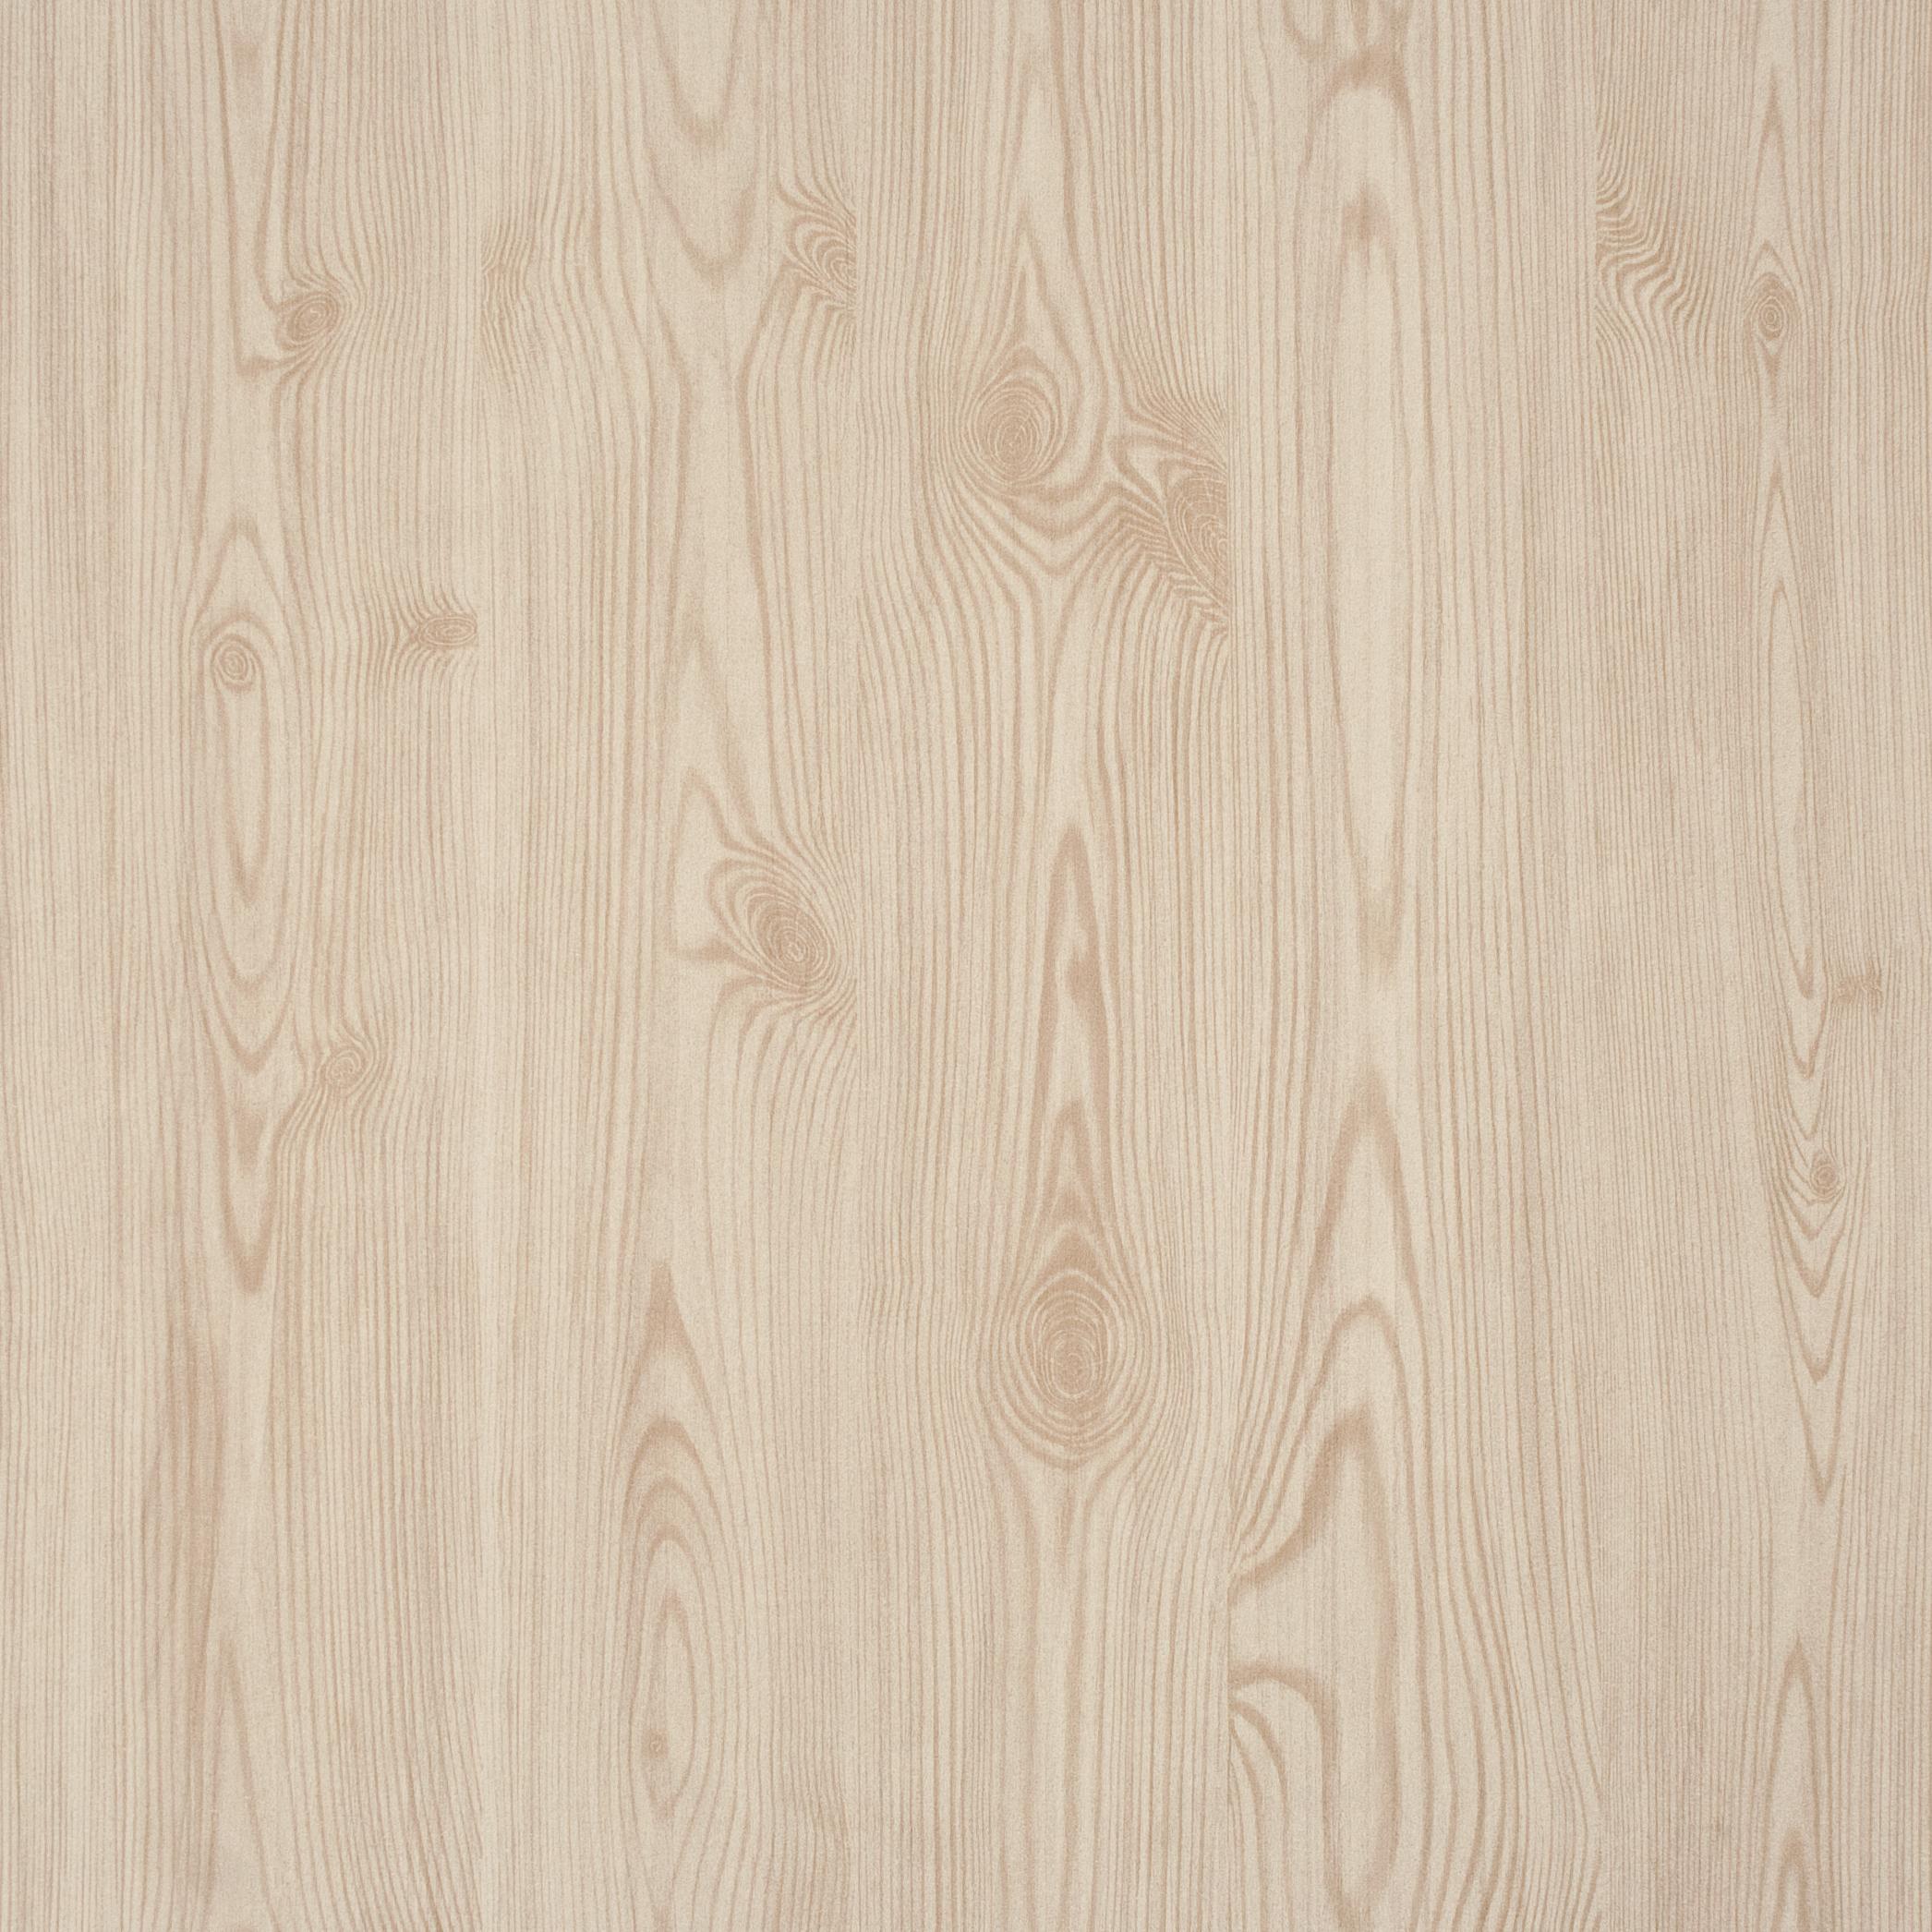 49 Dollhouse Wallpaper And Flooring On Wallpapersafari